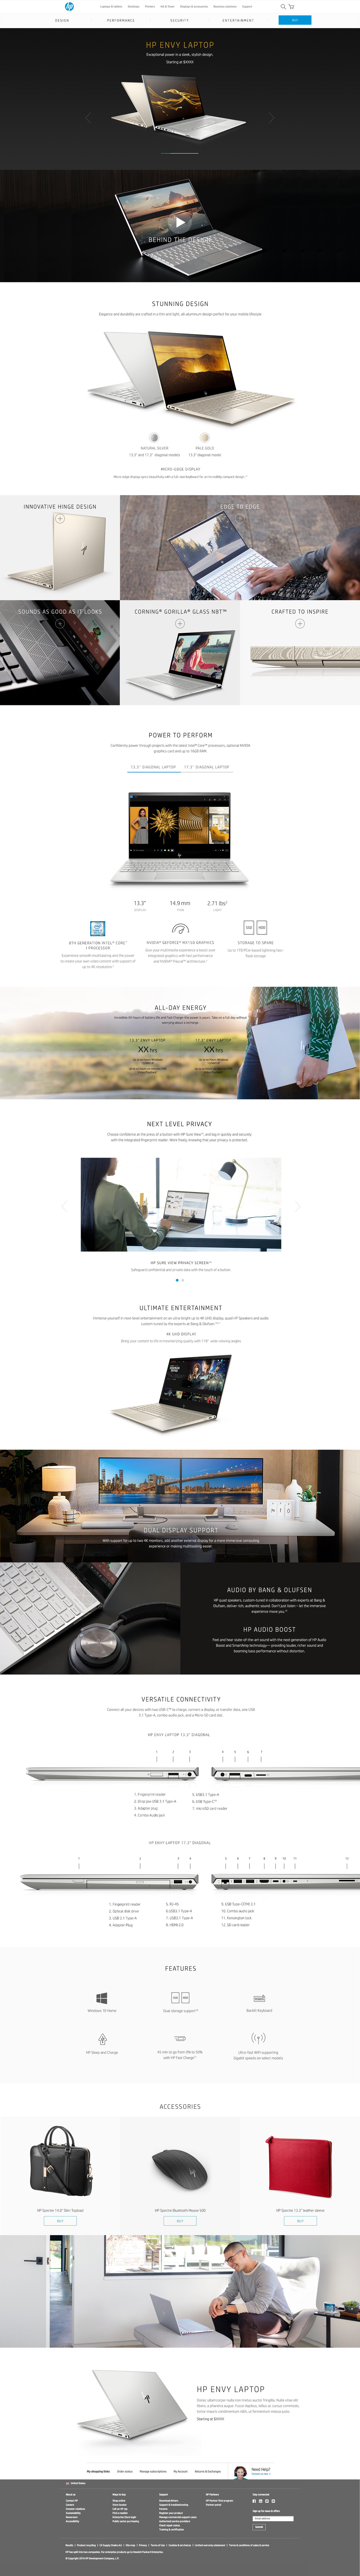 ENVY Desktop.jpg